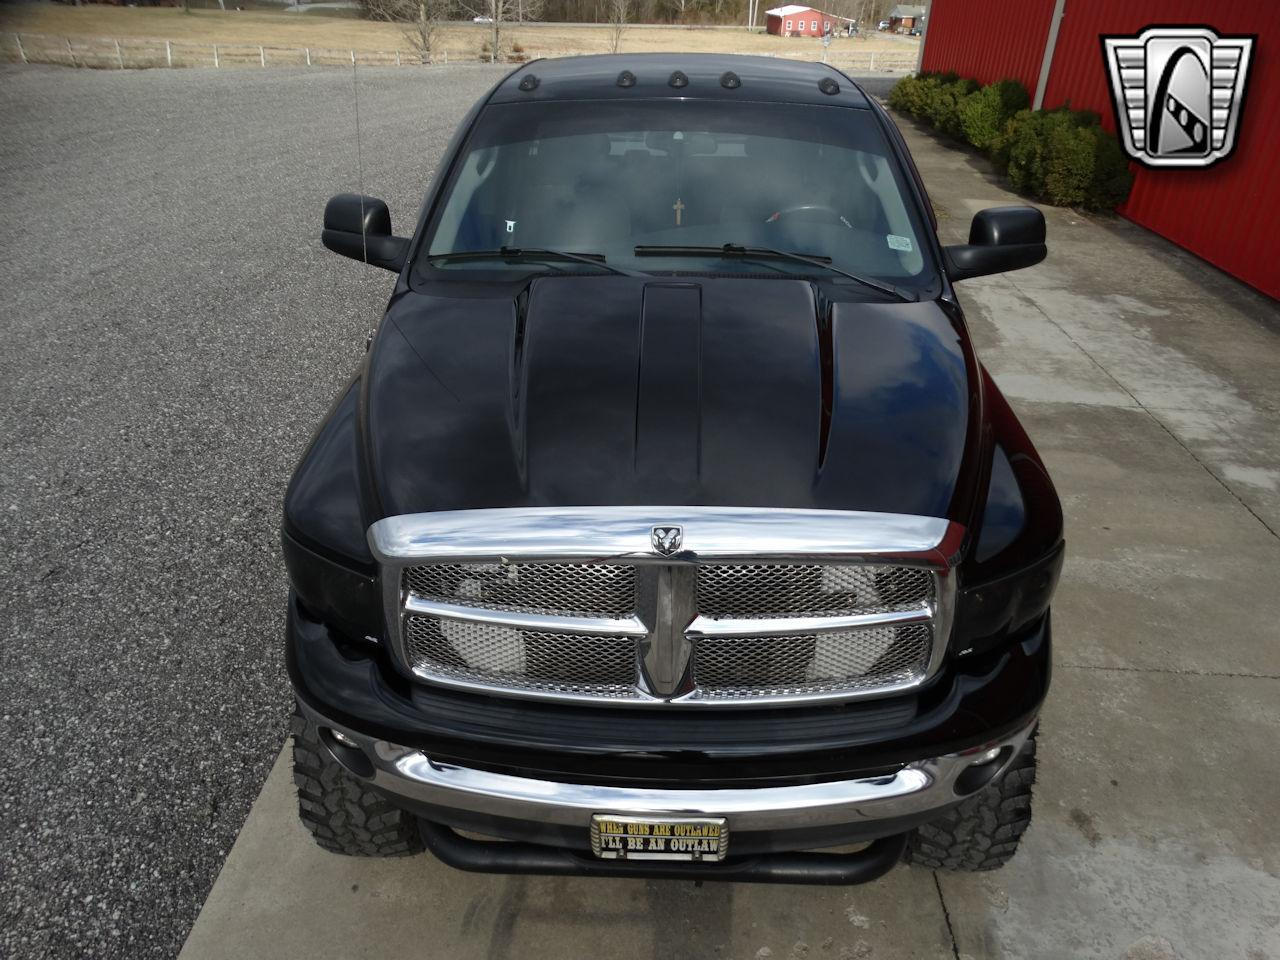 2005 Dodge Ram 6